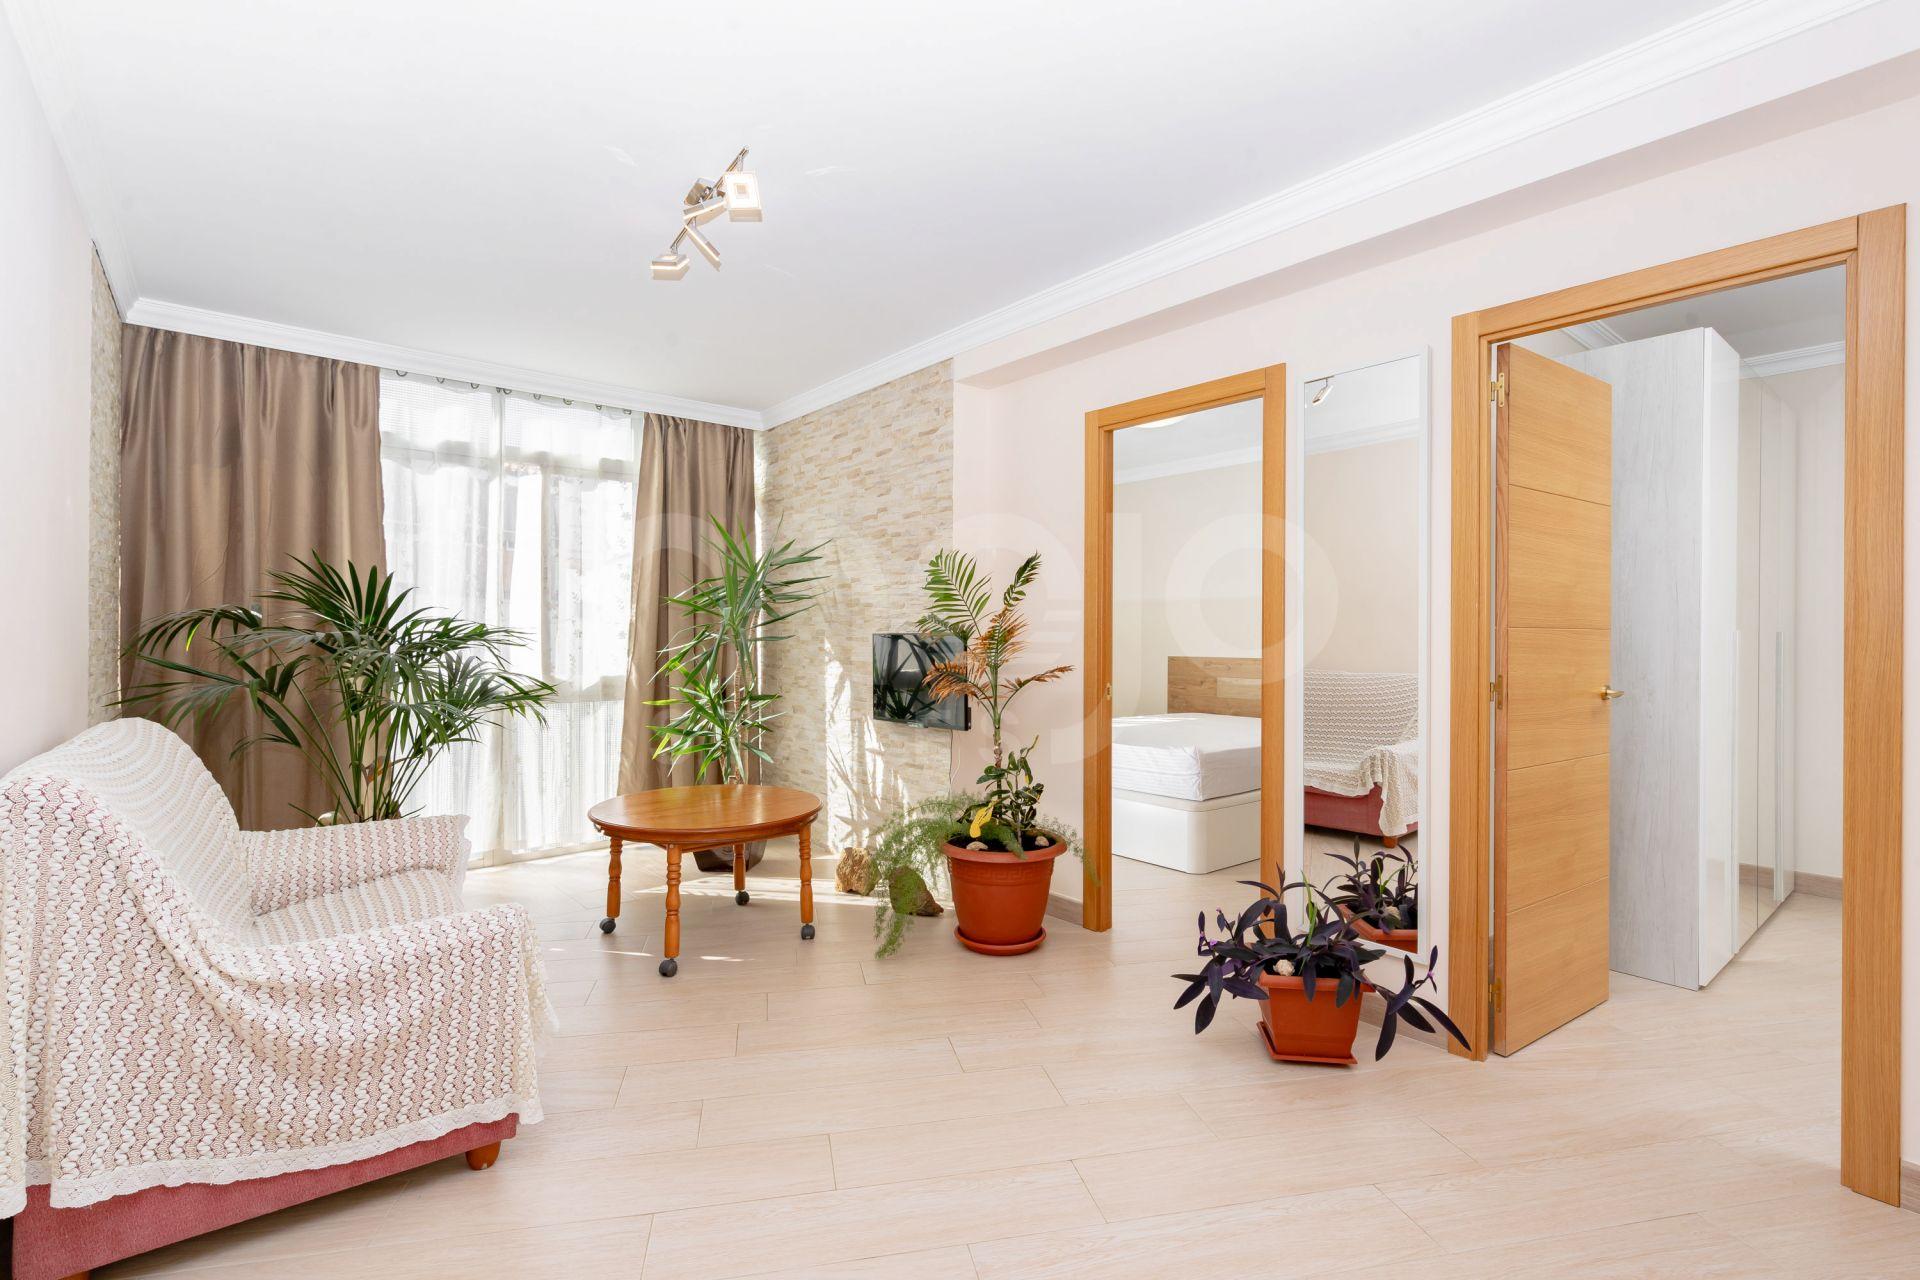 Apartment for sale in Fuengirola Centro